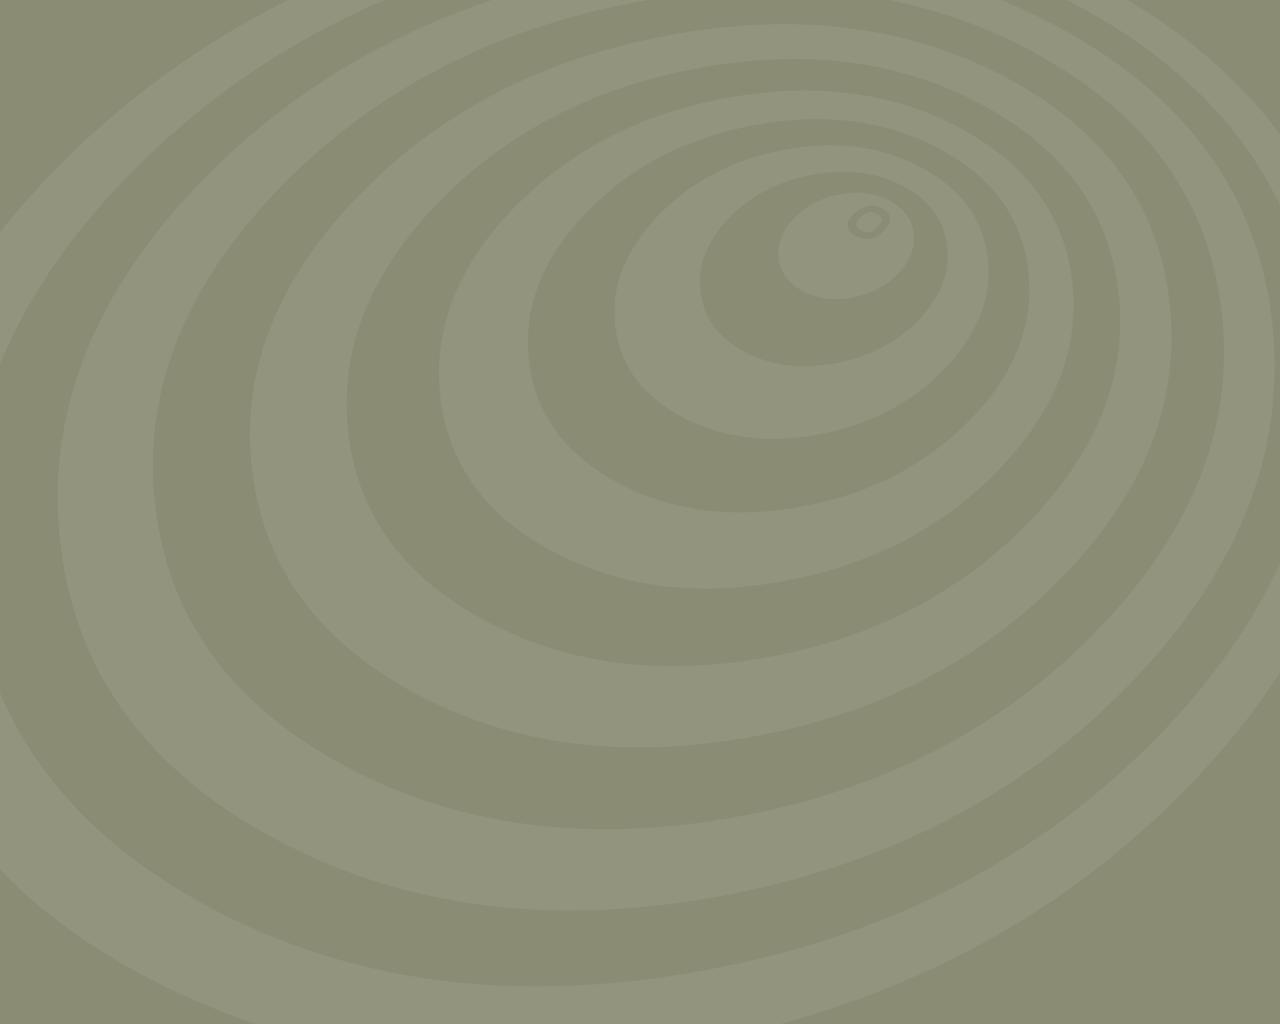 Olive Swirl by titanpsp